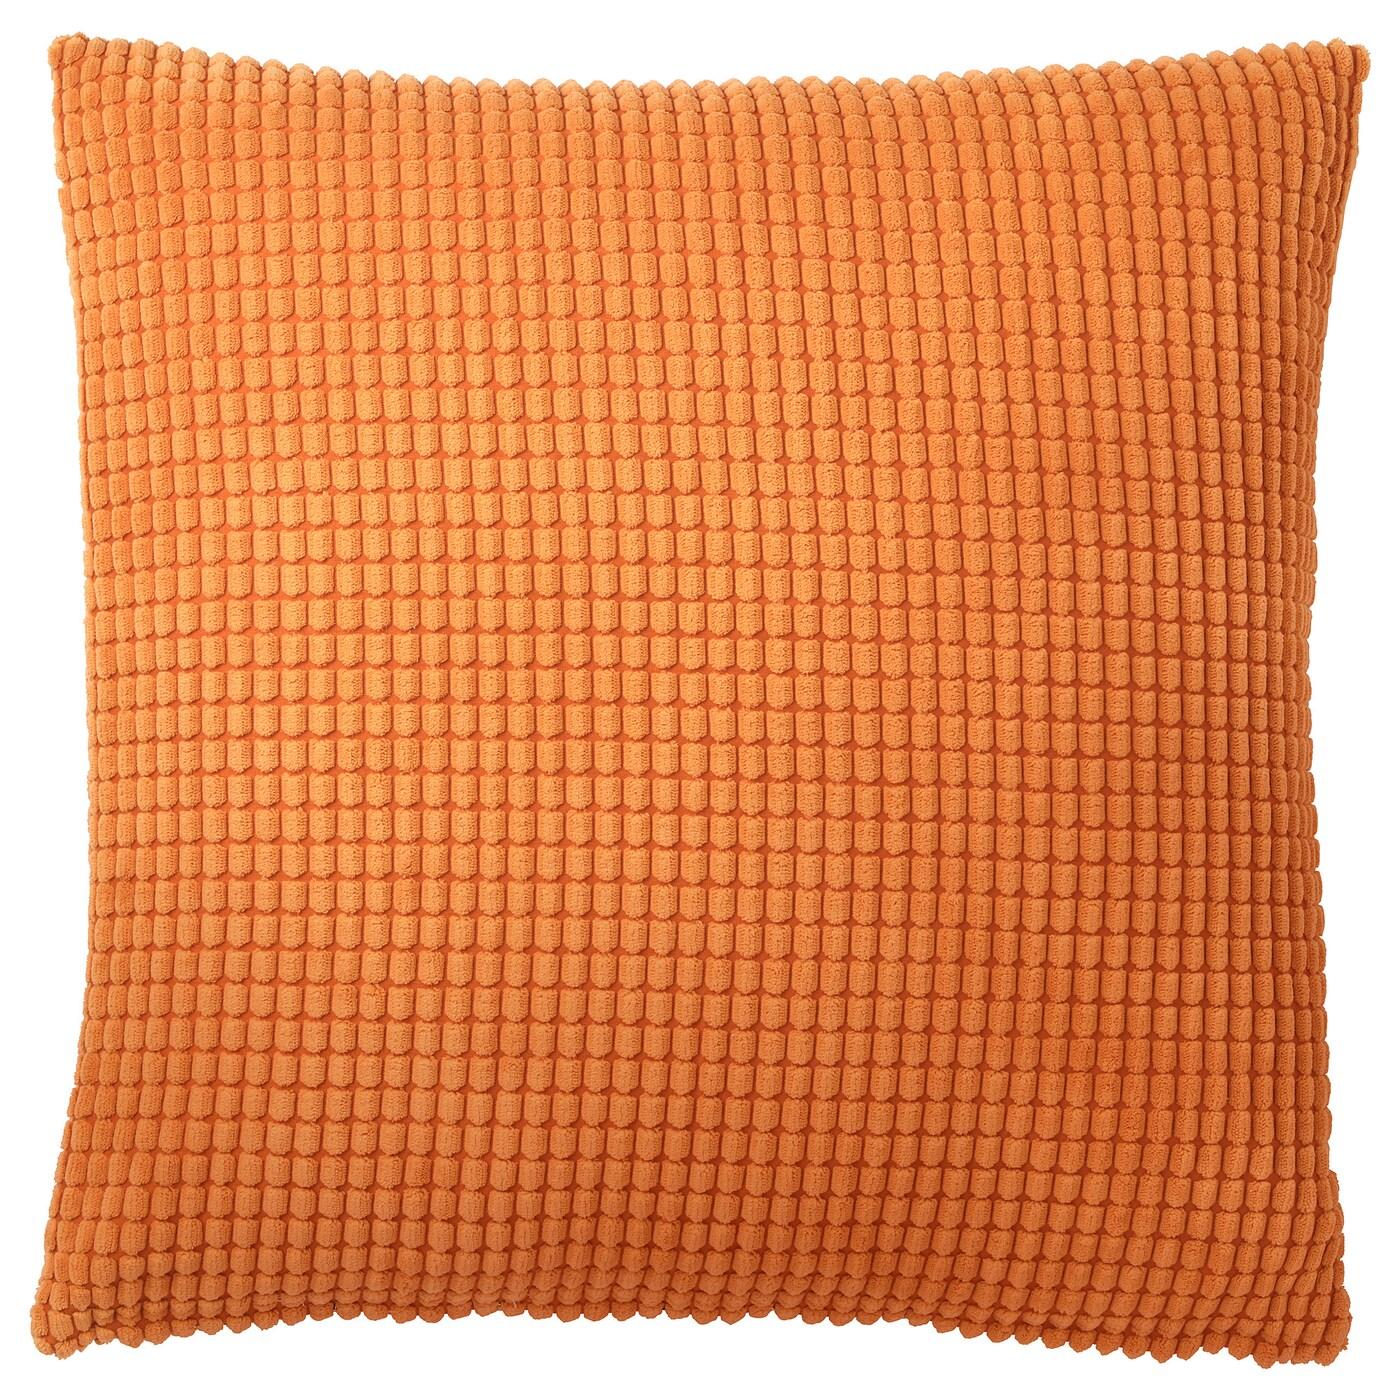 GULLKLOCKA Funda de cojín naranja 50x50 cm